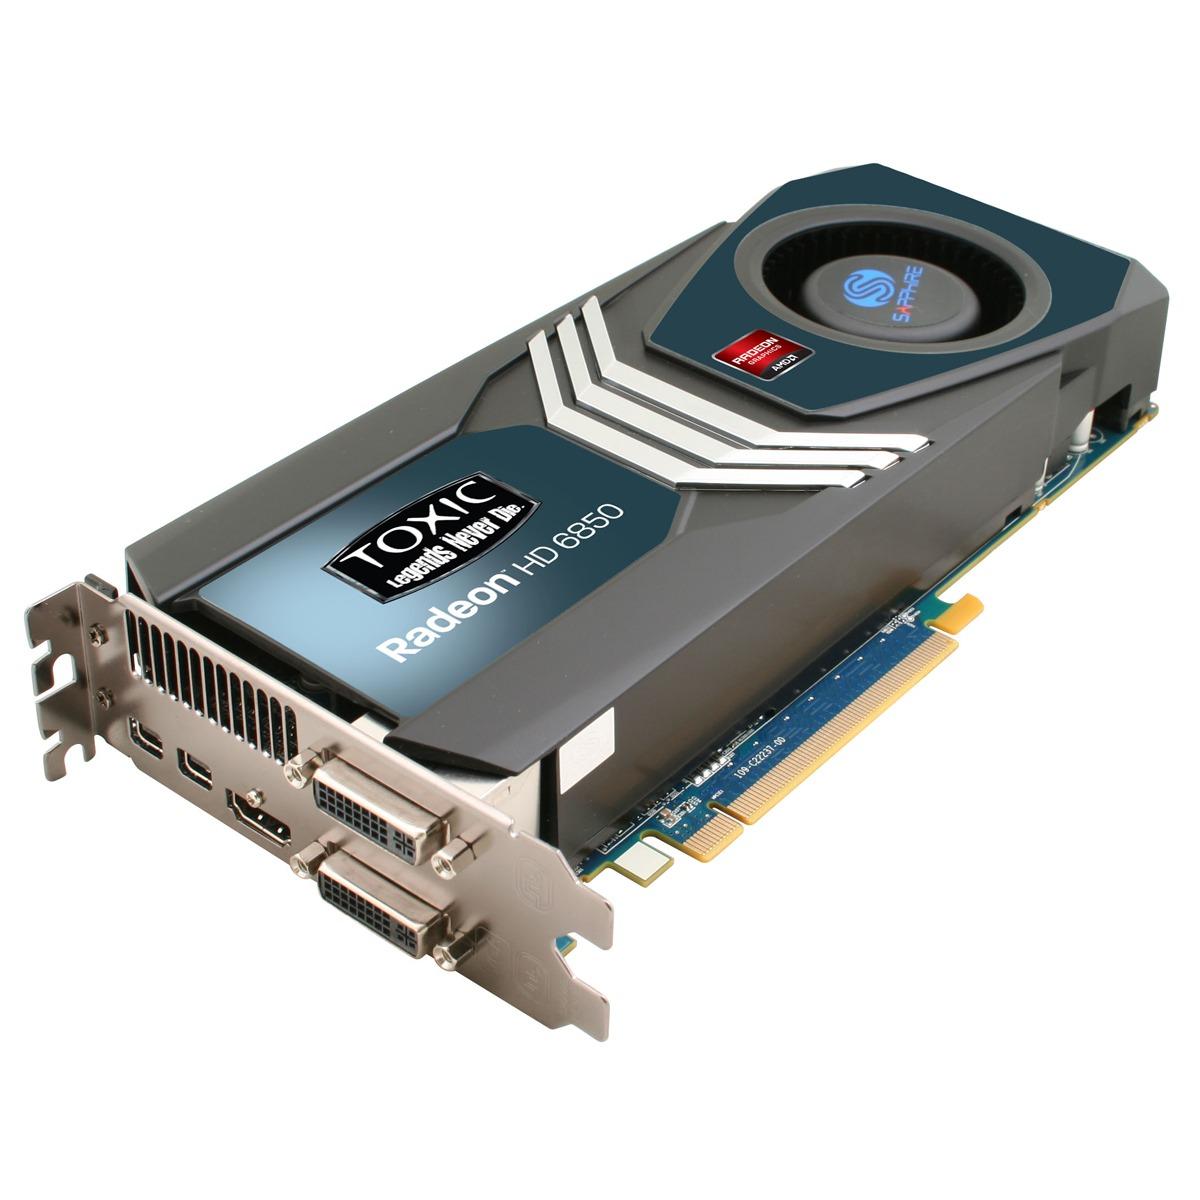 Carte graphique Sapphire Radeon HD 6850 TOXIC 1 GB 1 Go HDMI/Dual DVI/DisplayPort - PCI Express (AMD Radeon HD 6850)